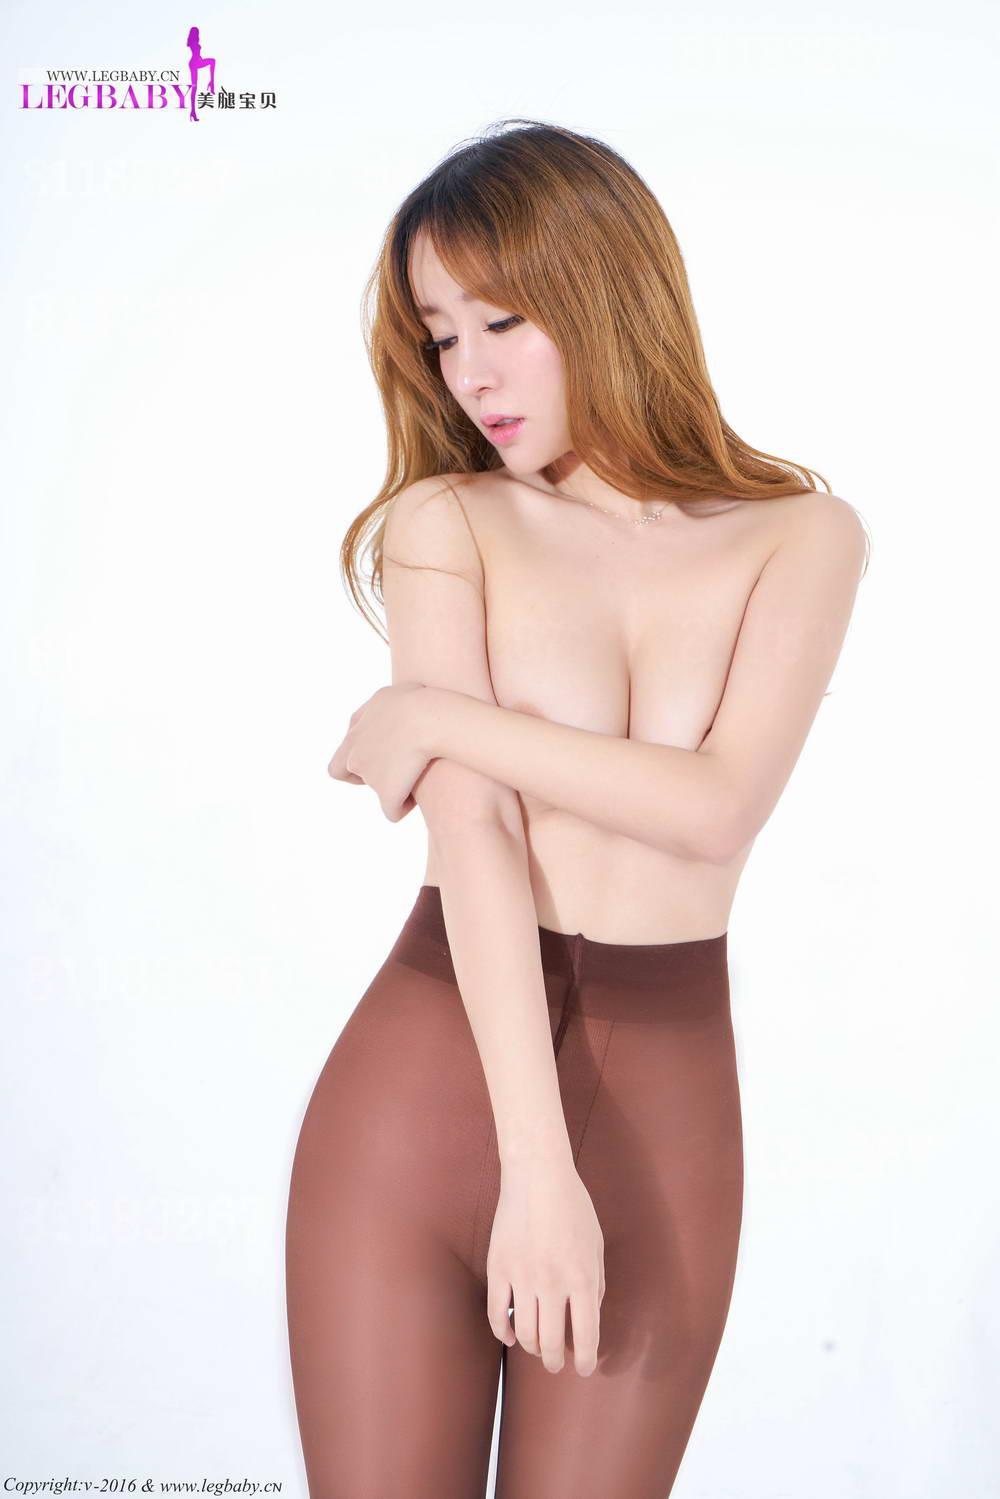 [LEGBABY美腿寶貝] 2016.06.21 NO.019 王語純 OL裝[/25MB]